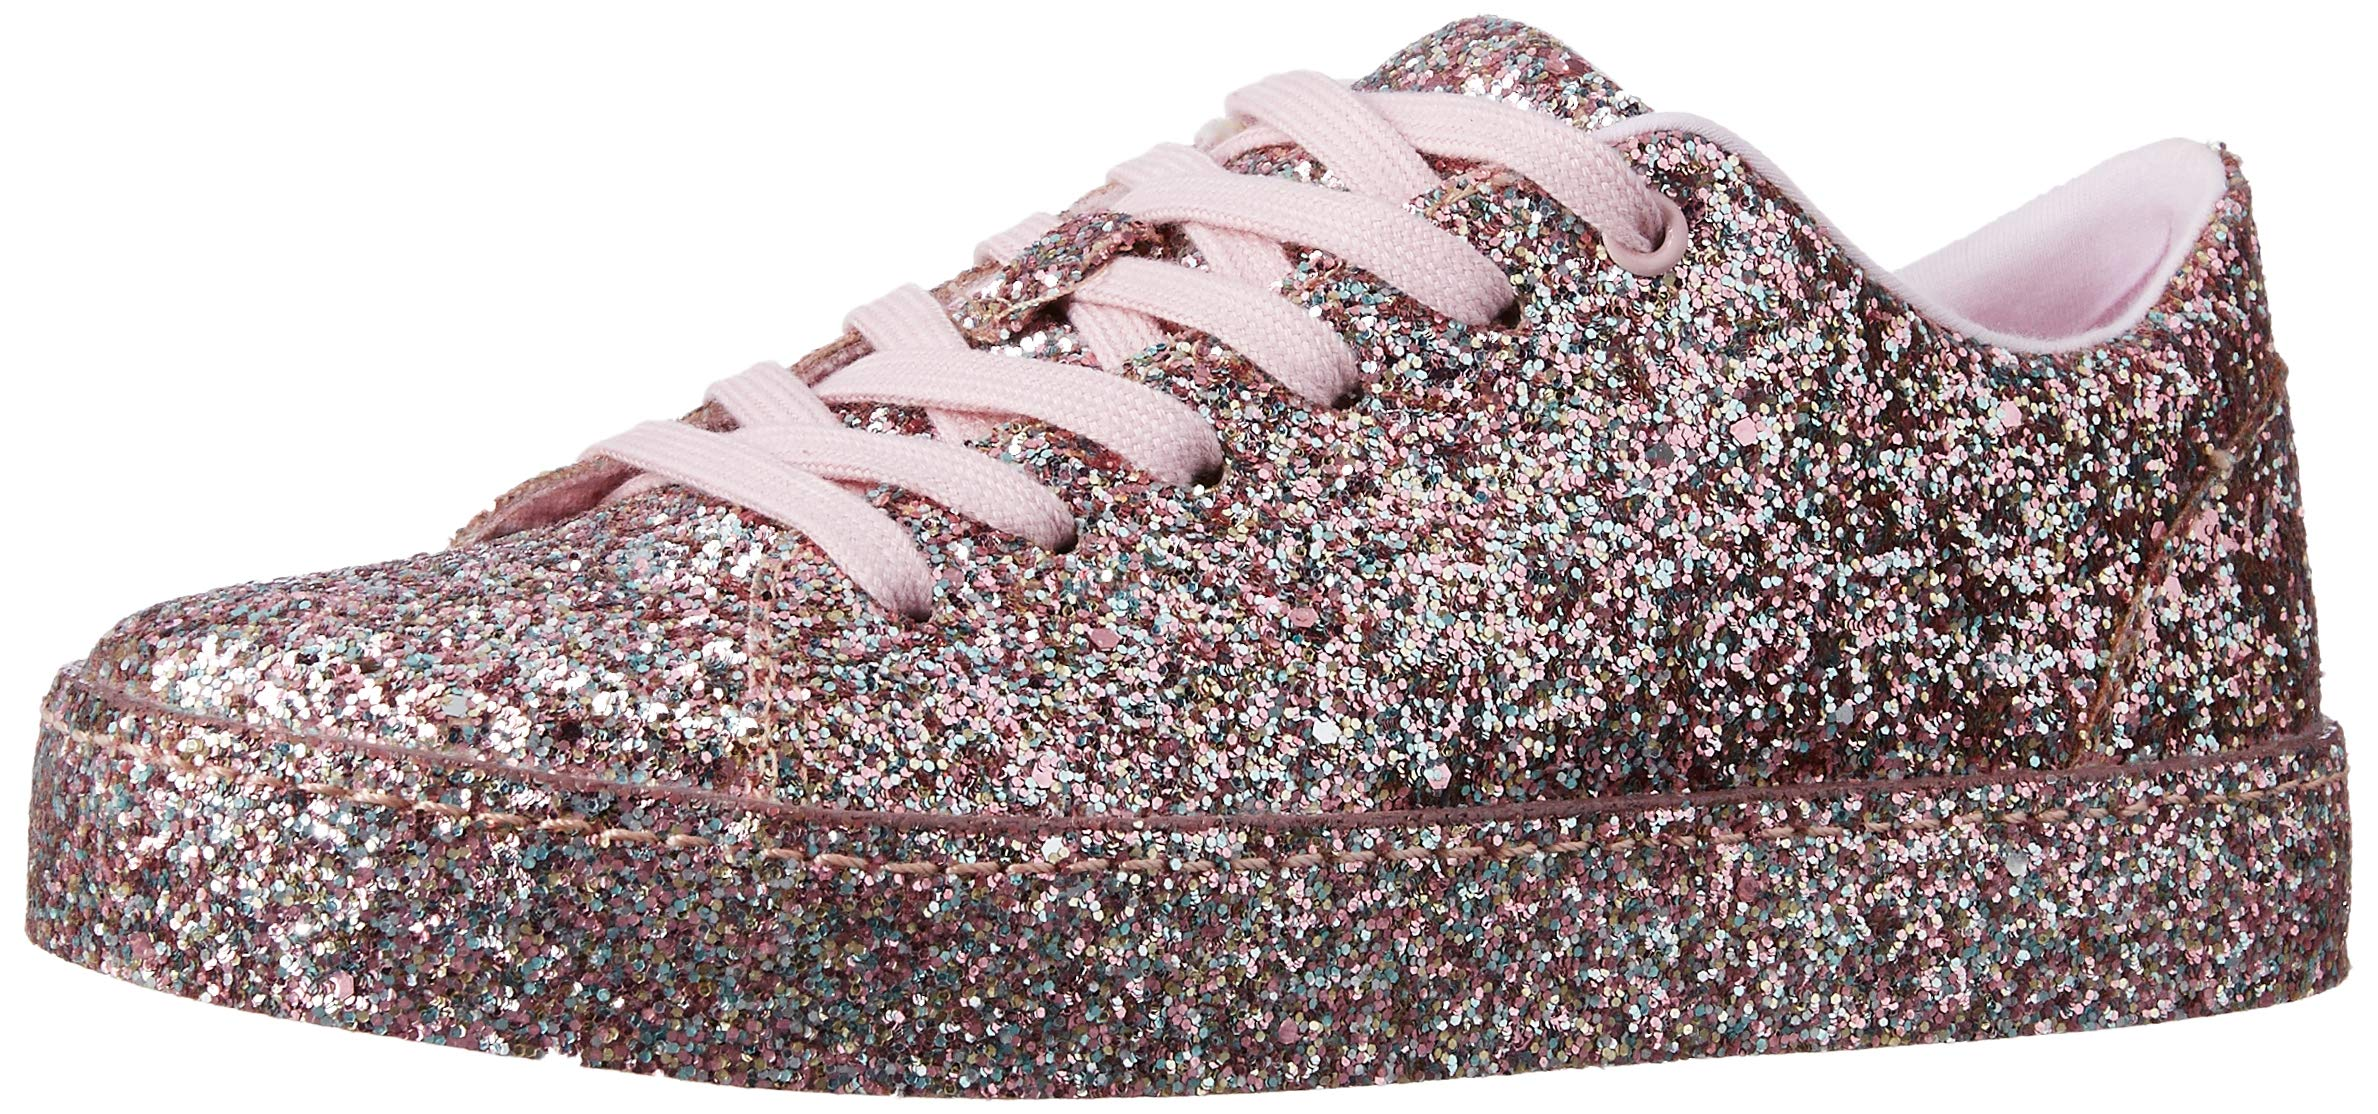 Aldo Eu Basses EtiliviaSneakers Pink38 FemmeRoseparfait TF3u1JlKc